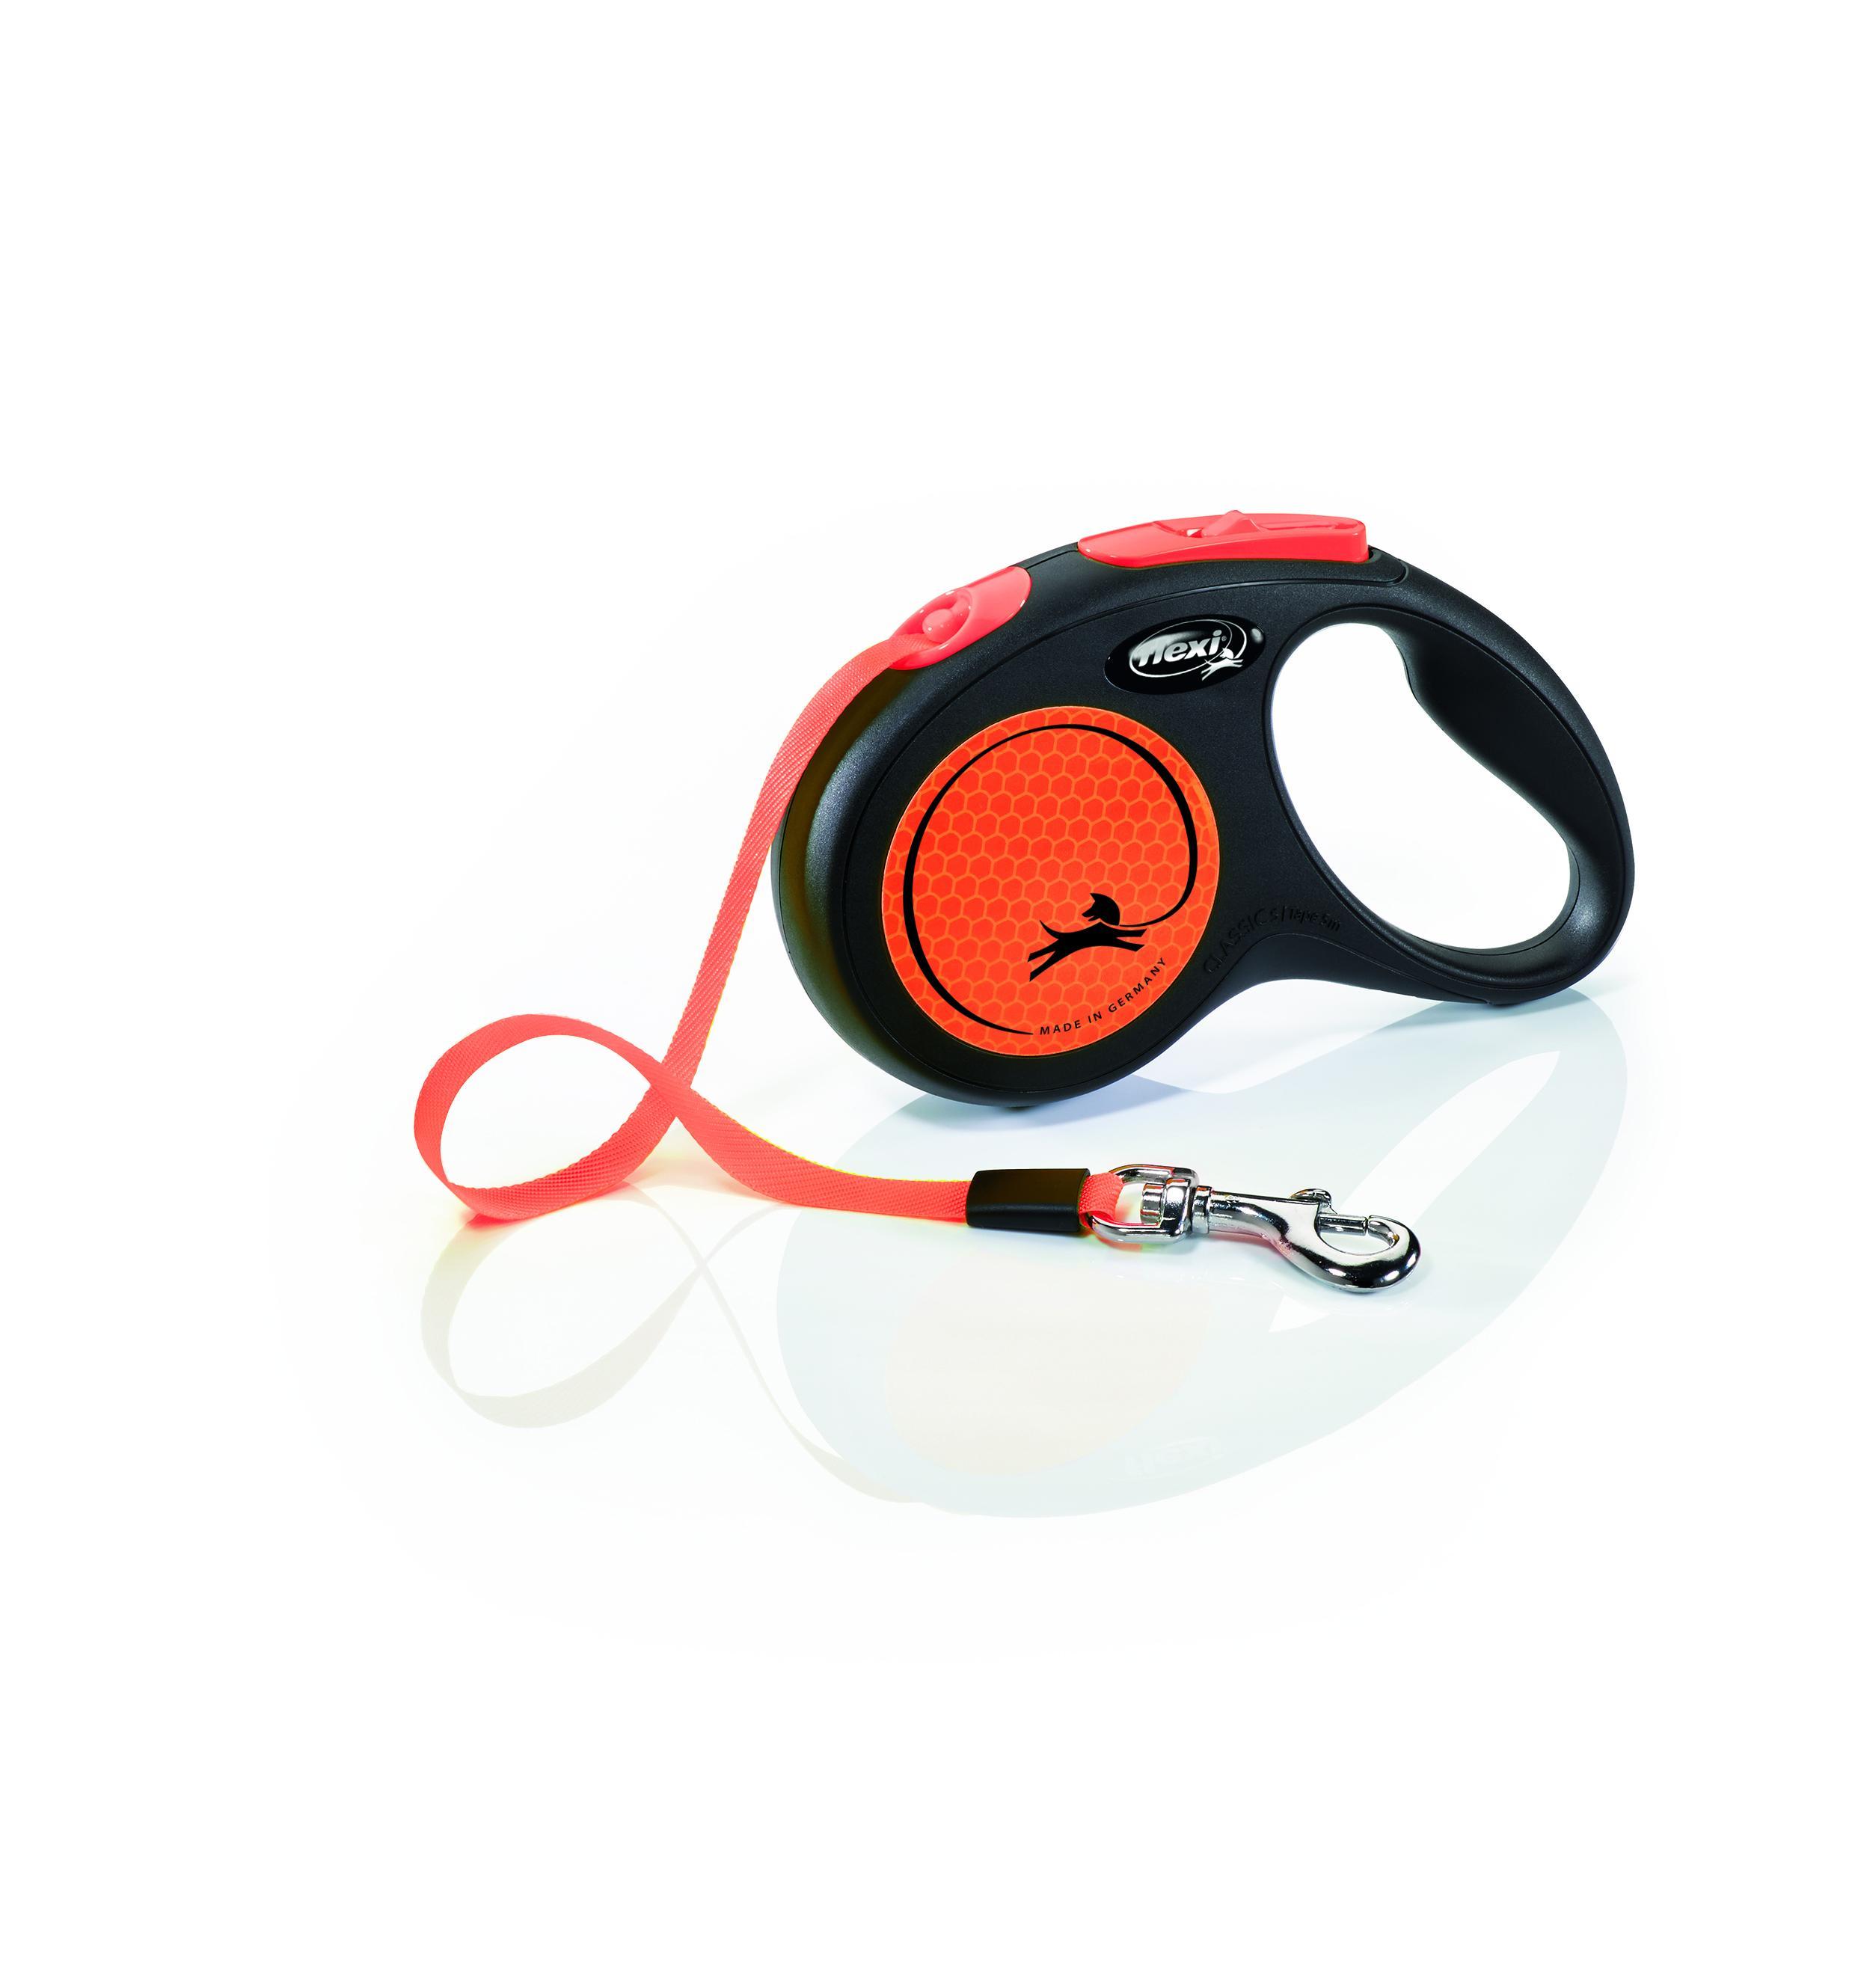 Flexi New Neon Tape Dog Leash, Black/Orange, Small, 16-ft